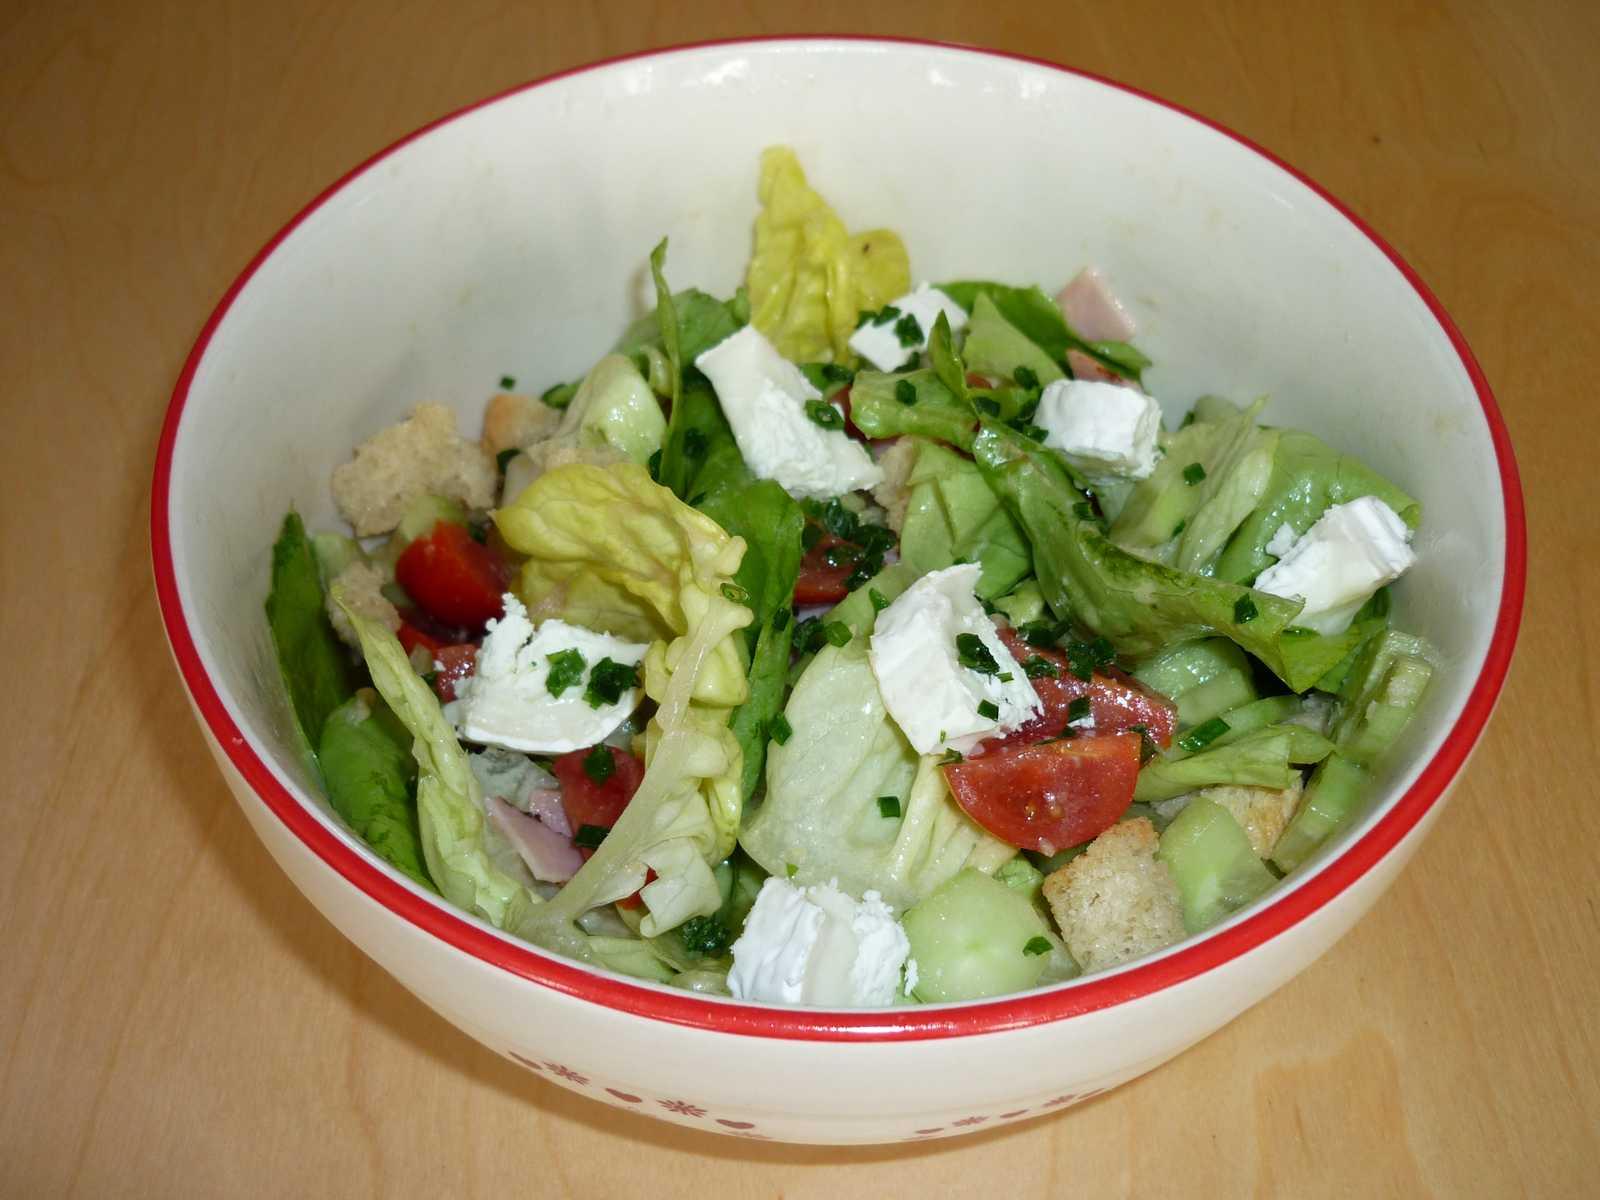 Le blog 39 art d 39 aurore - Salade verte composee ...